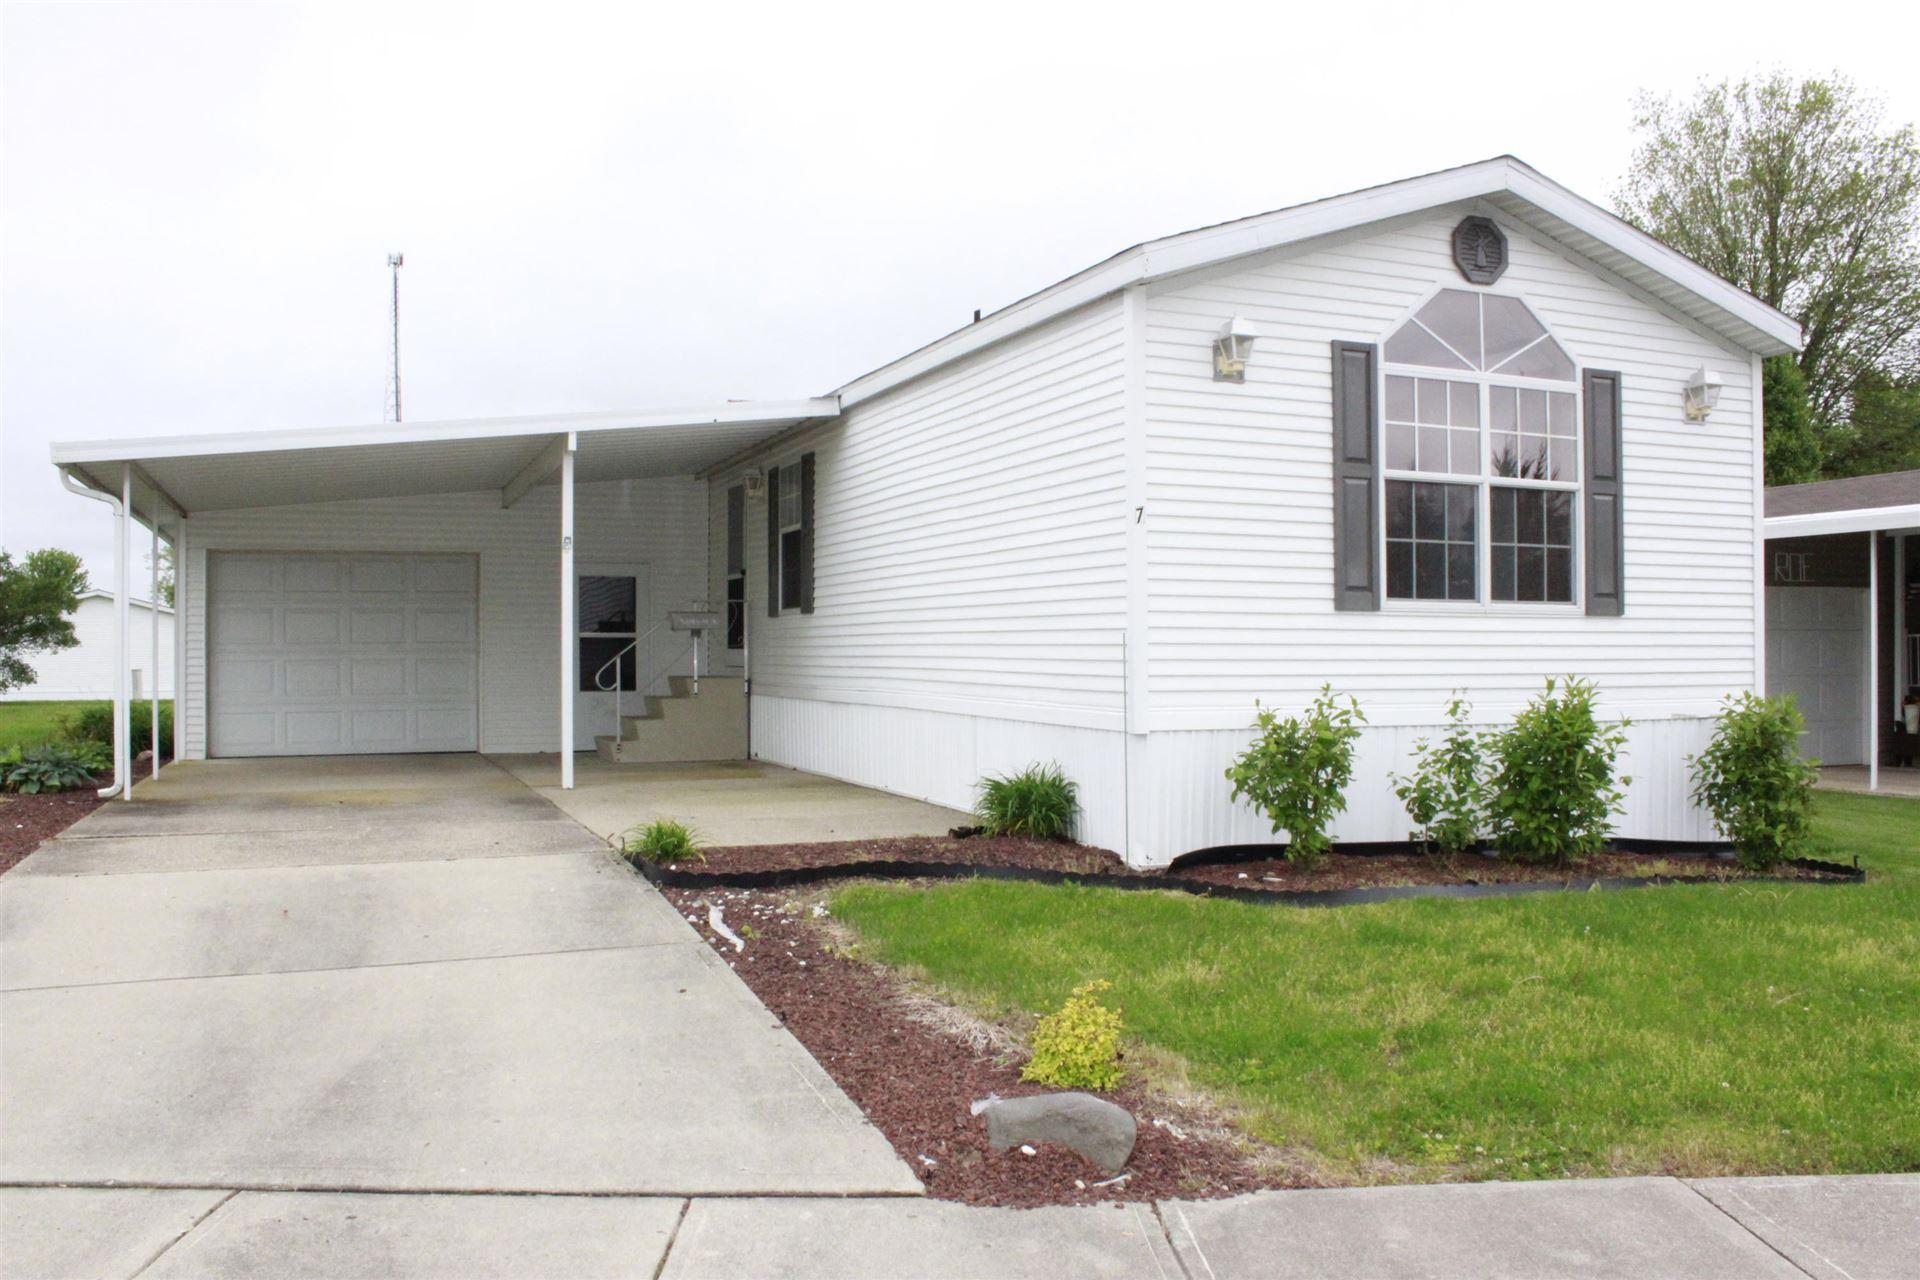 7 Beech Drive, Springfield, OH 45504 - MLS#: 1003107